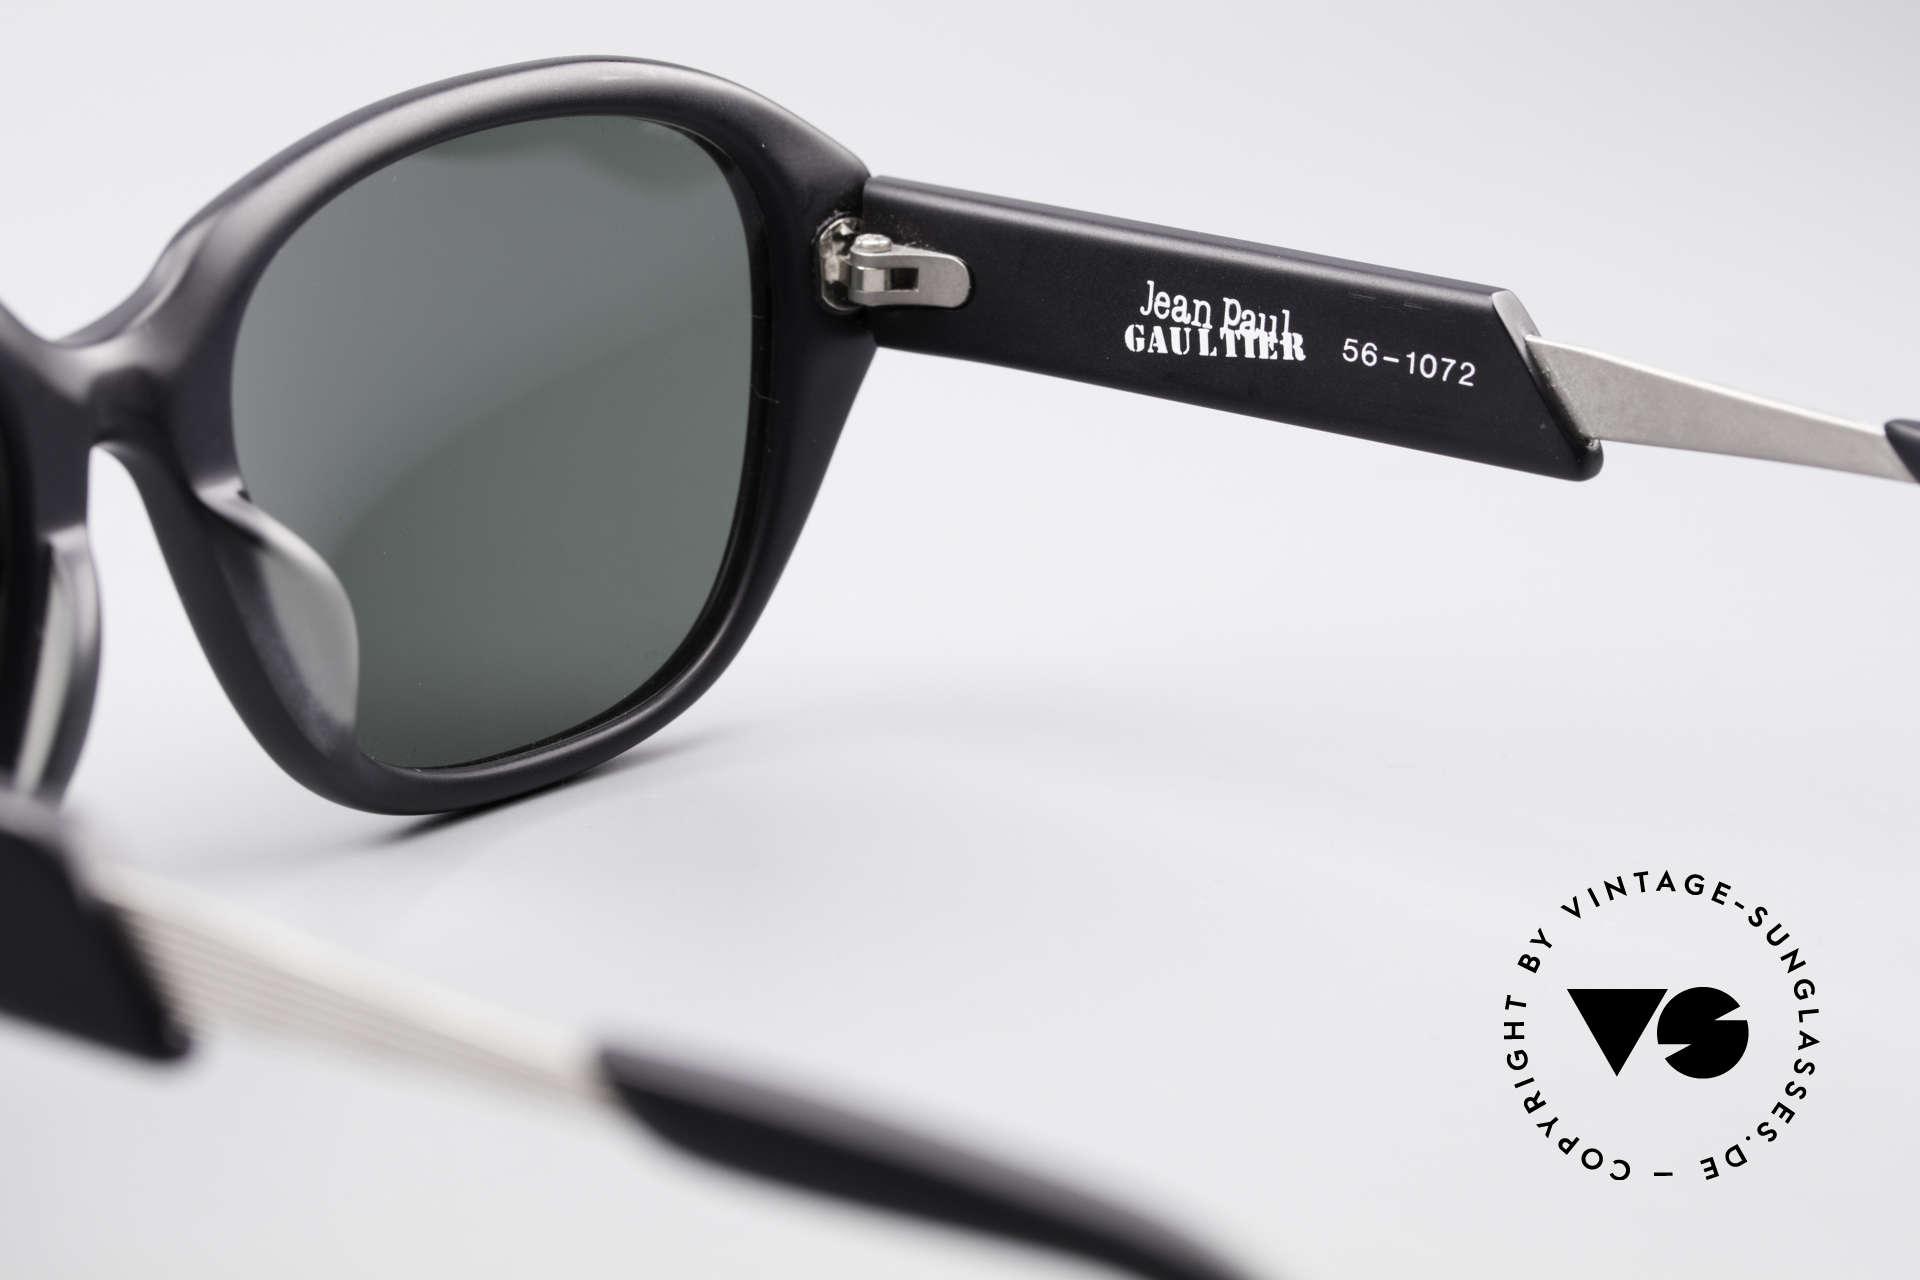 Jean Paul Gaultier 56-1072 Designer 90's Sunglasses, Size: medium, Made for Men and Women